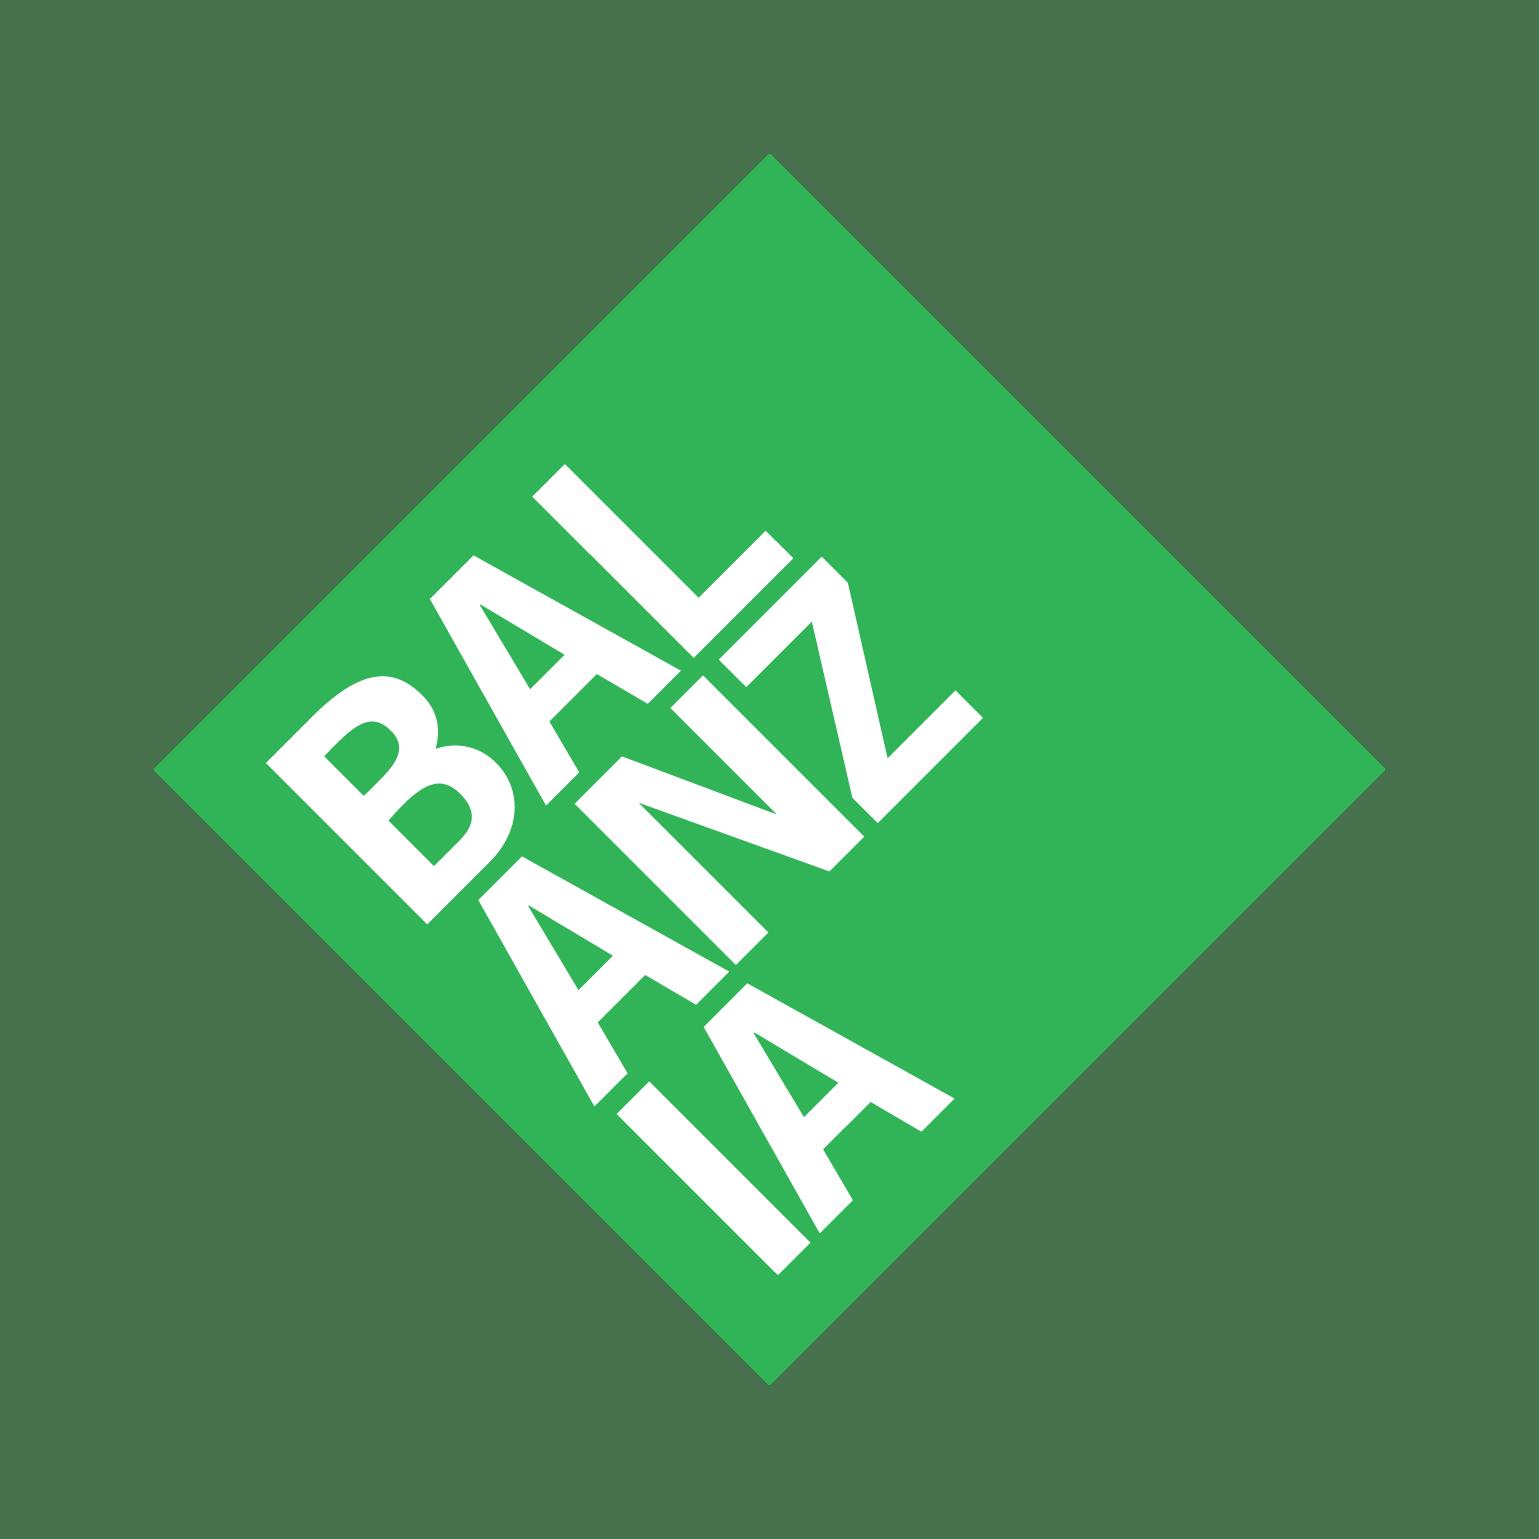 Balanzia